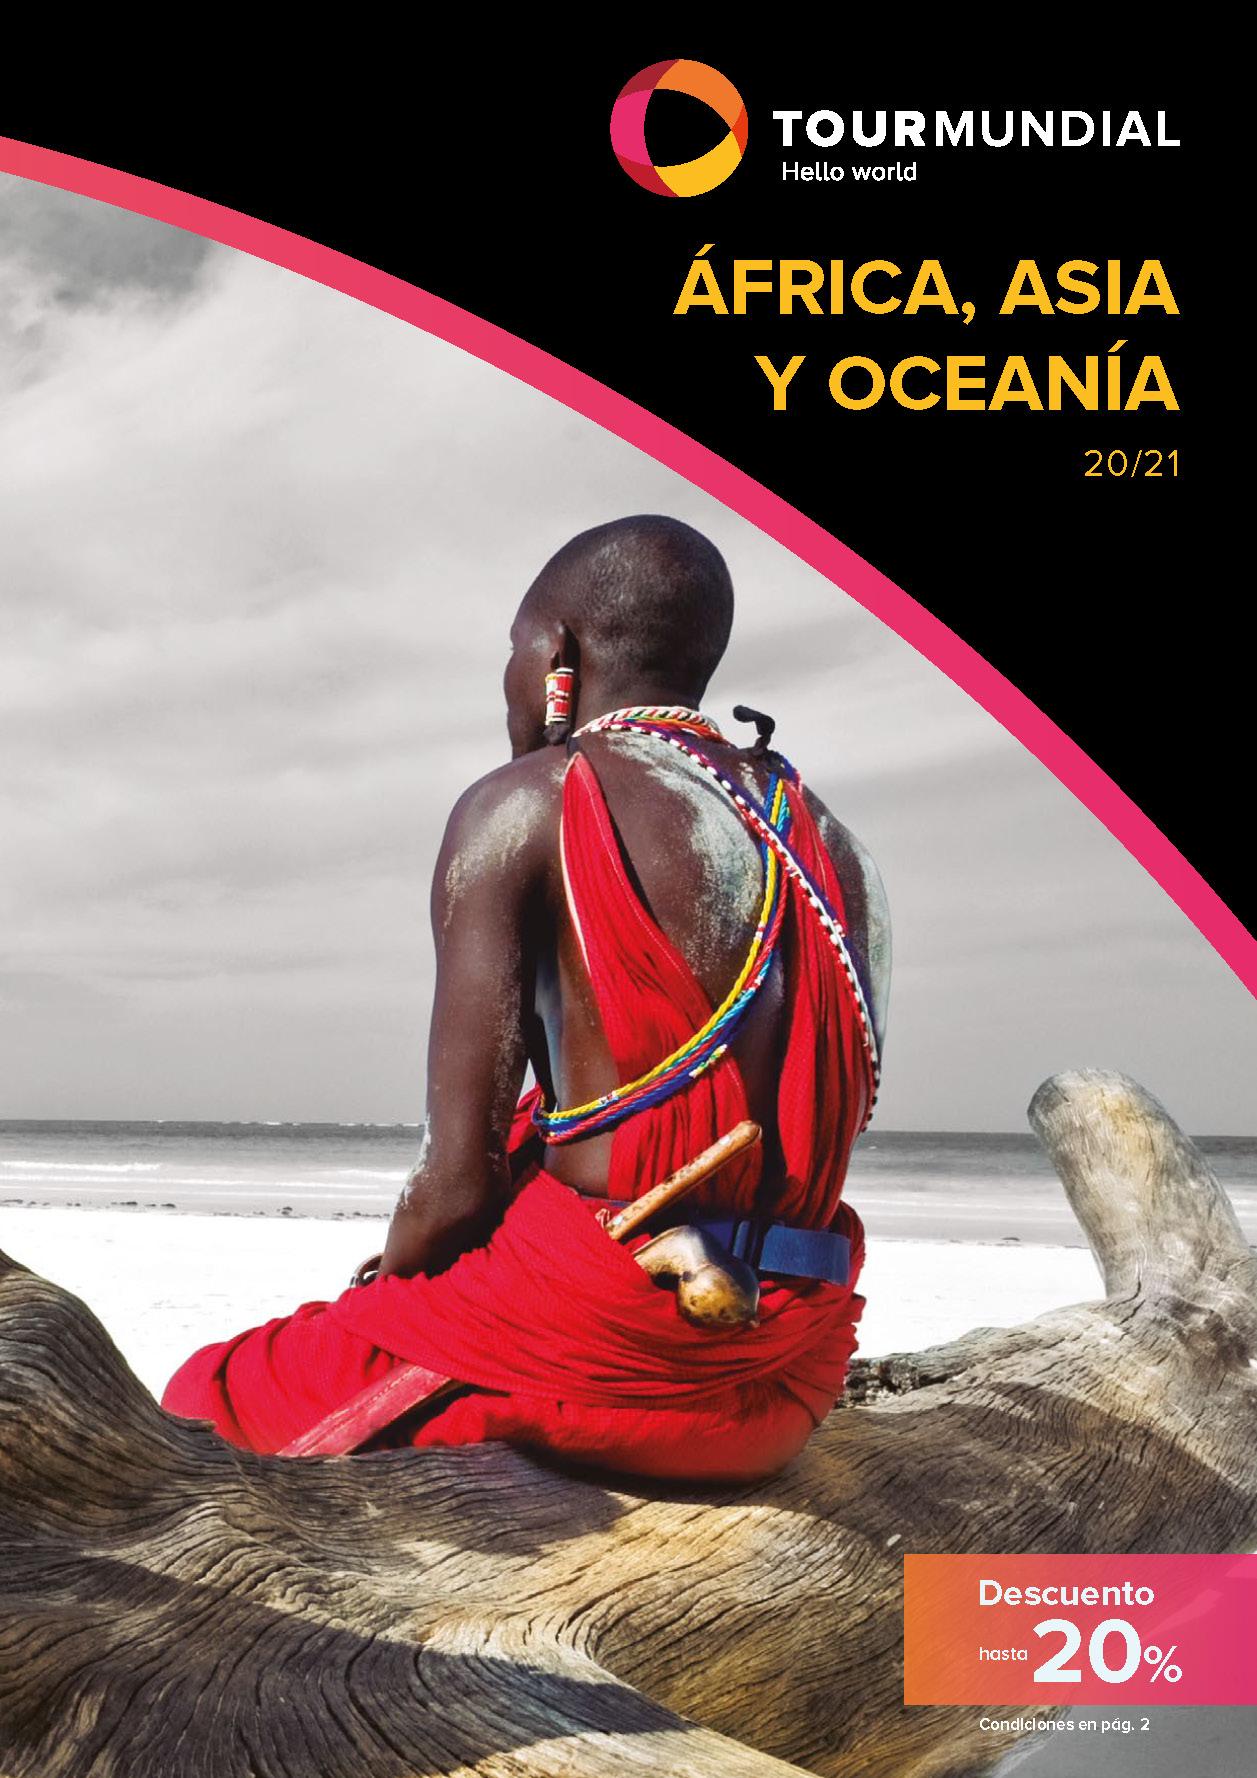 Catalogo Tourmundial Africa Asia y Oceanía 2020-2021